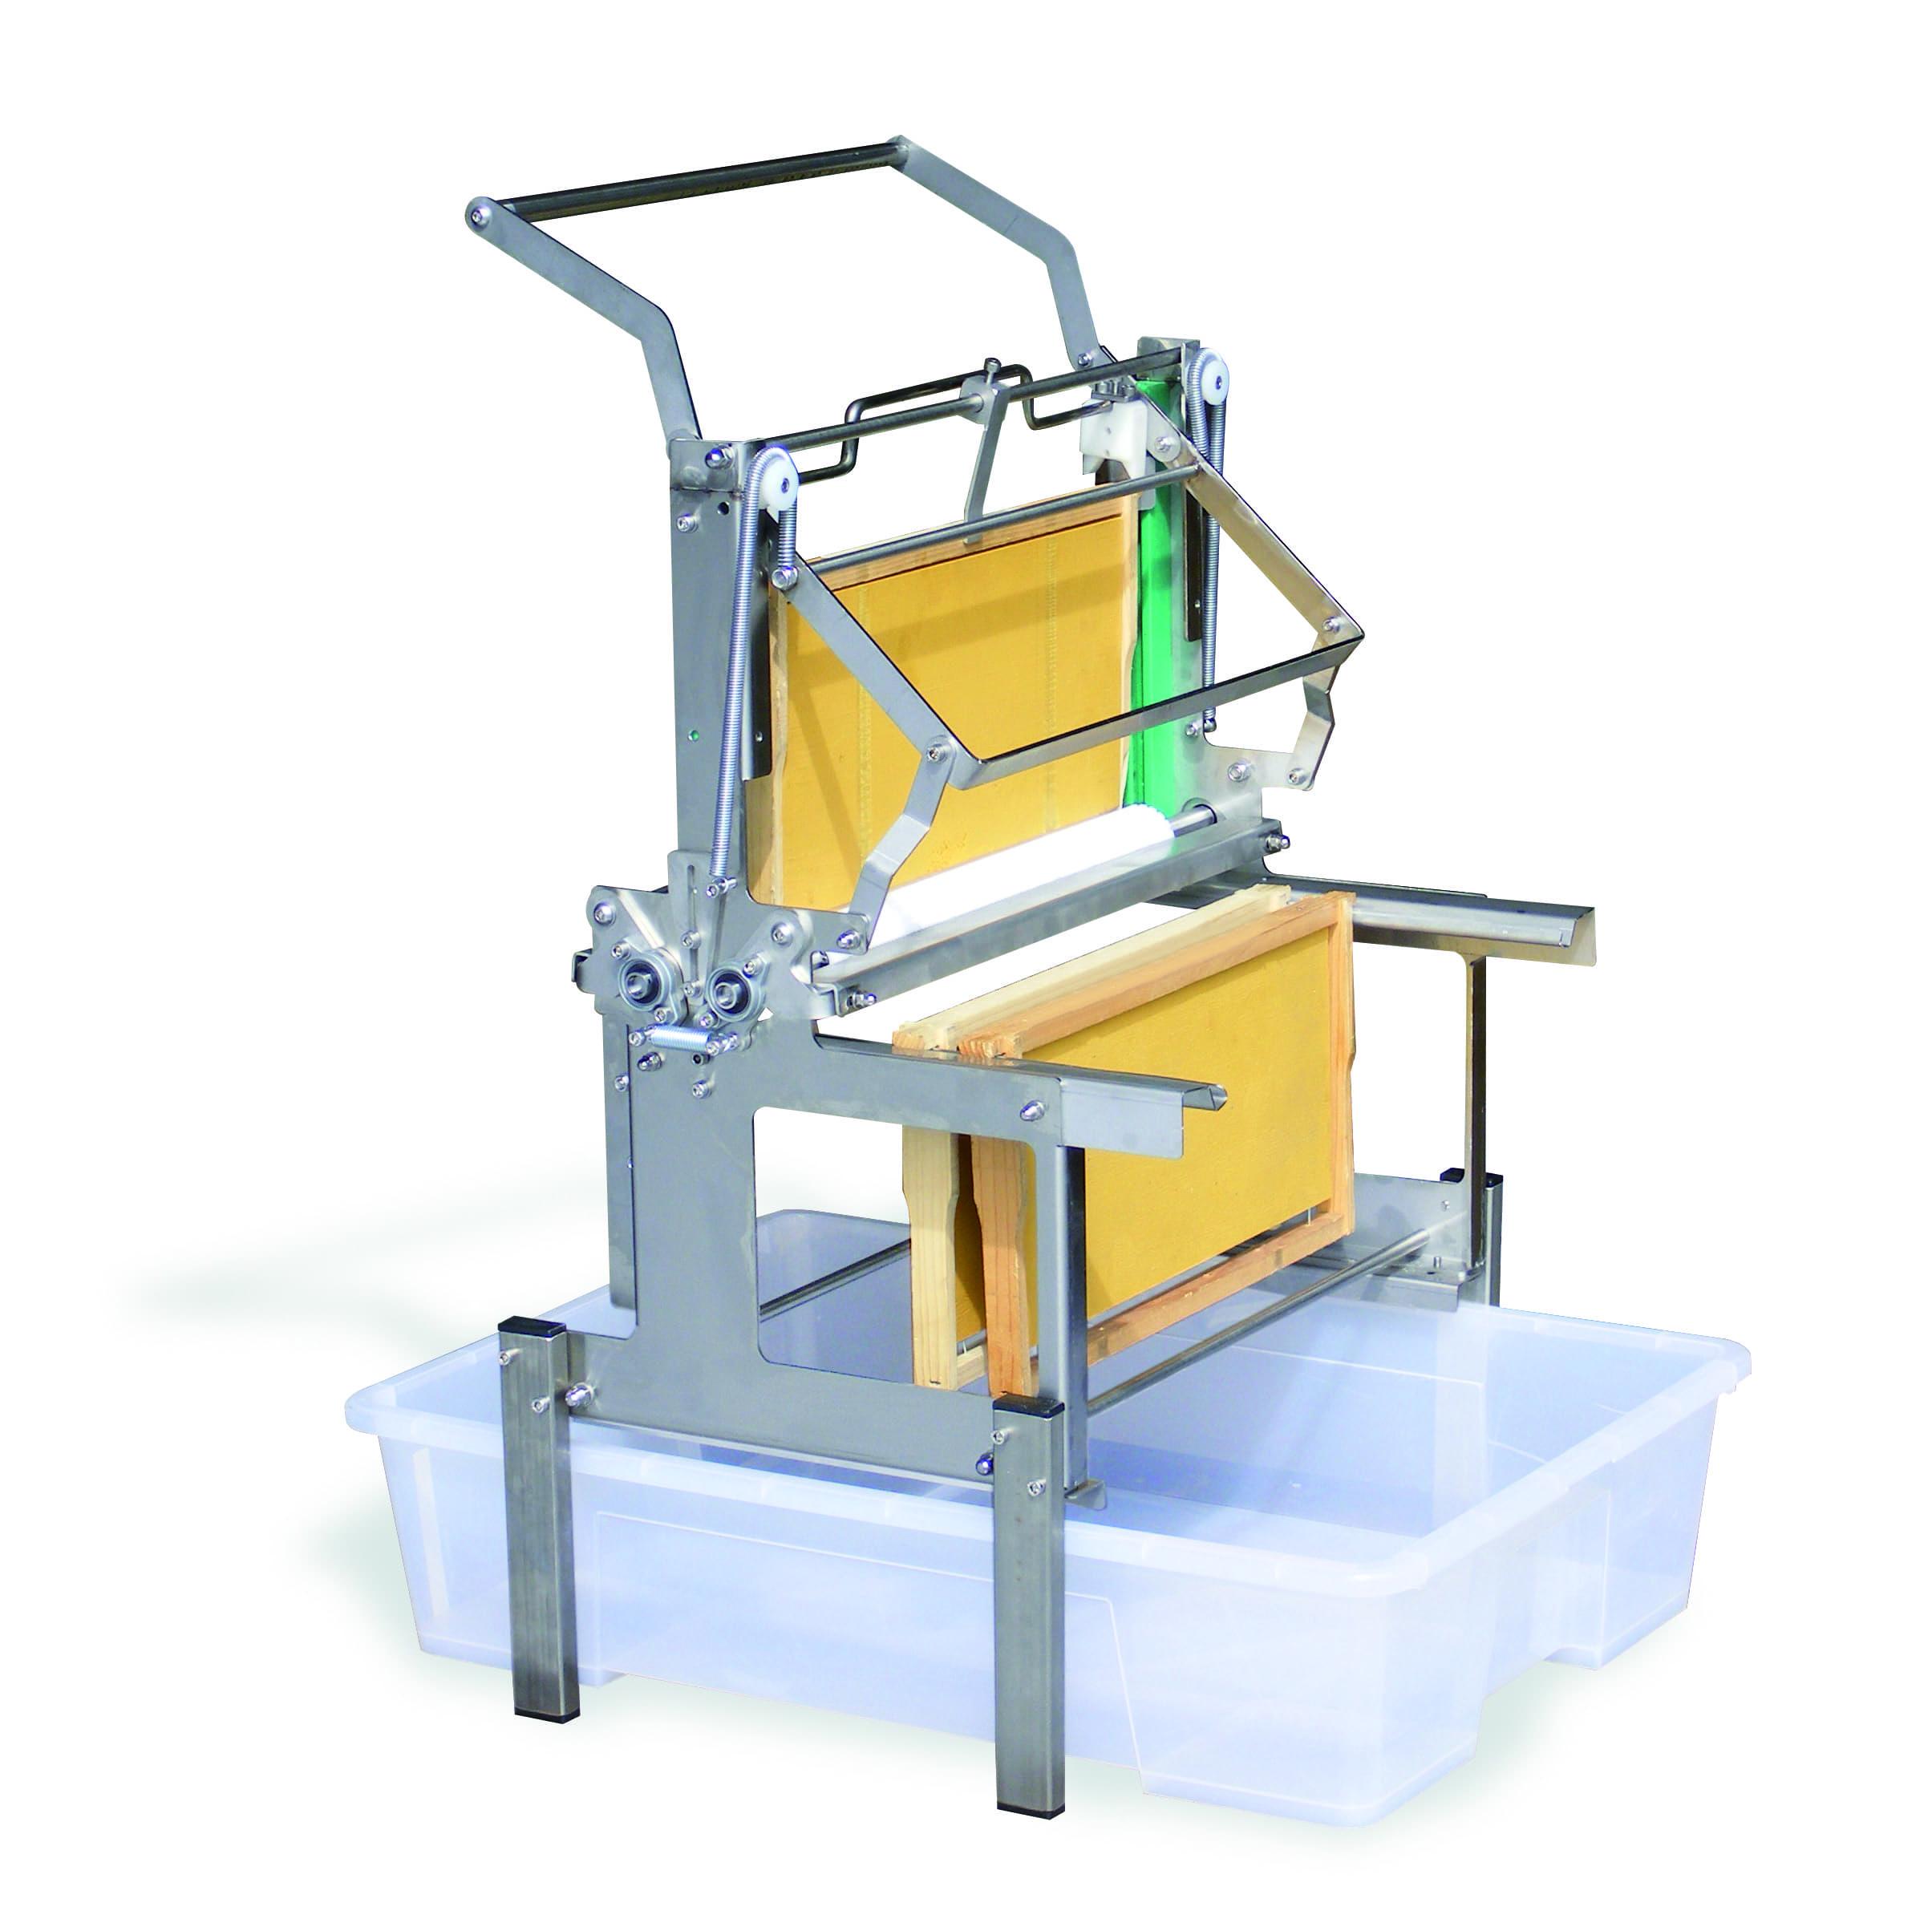 Entdecklungsmaschine Roll Zander, original Lega, Art. 4285R1